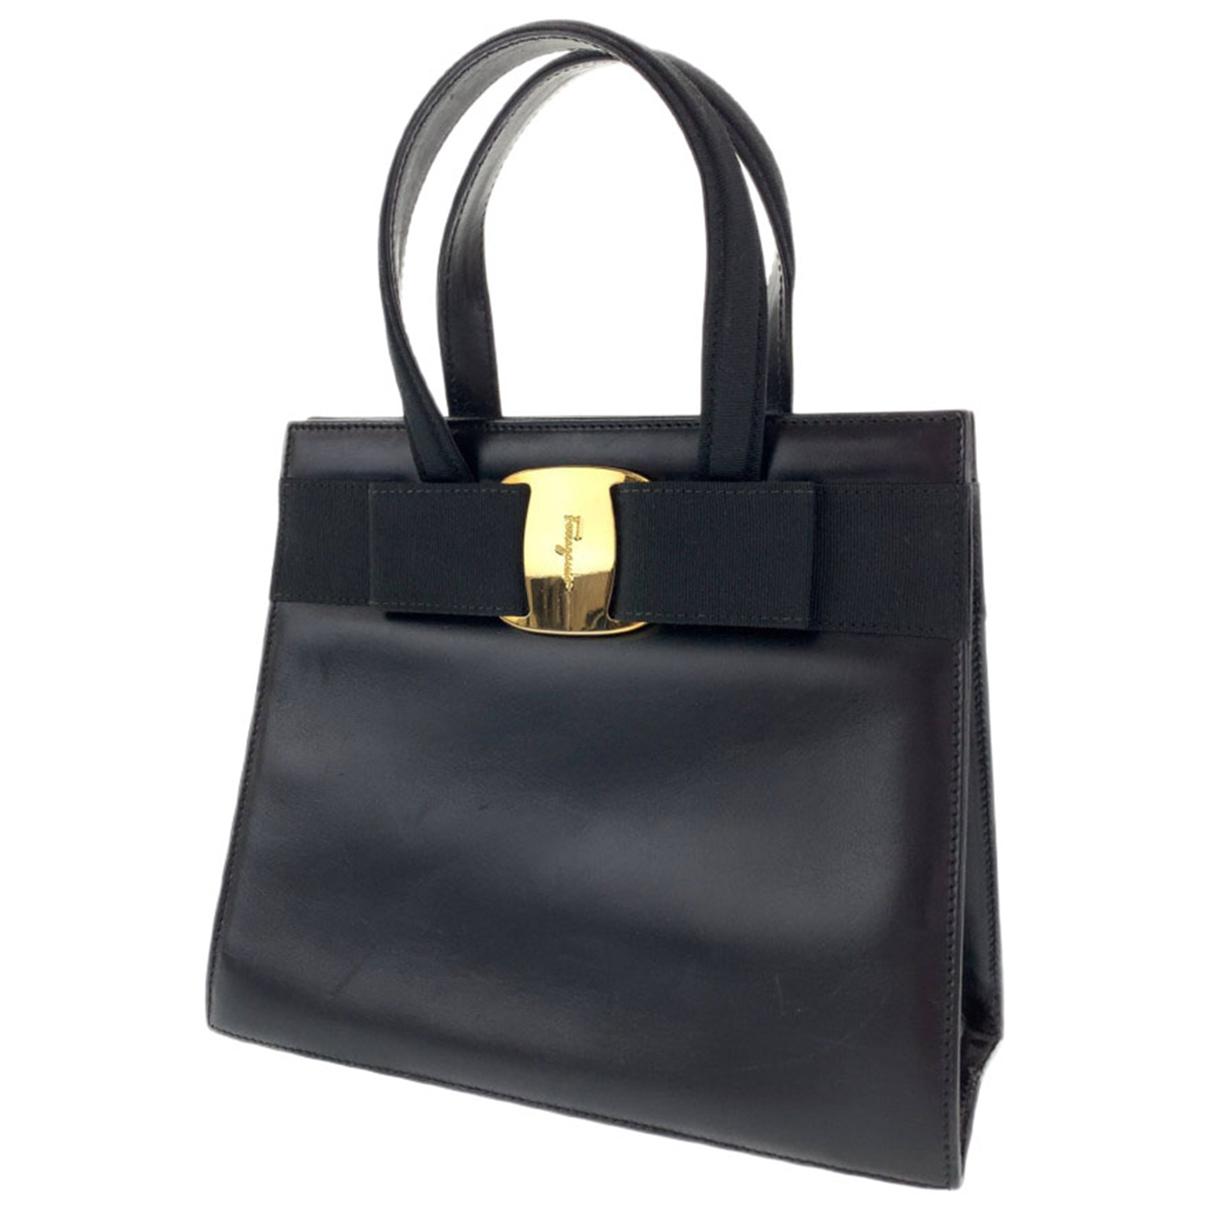 Salvatore Ferragamo N Leather handbag for Women N